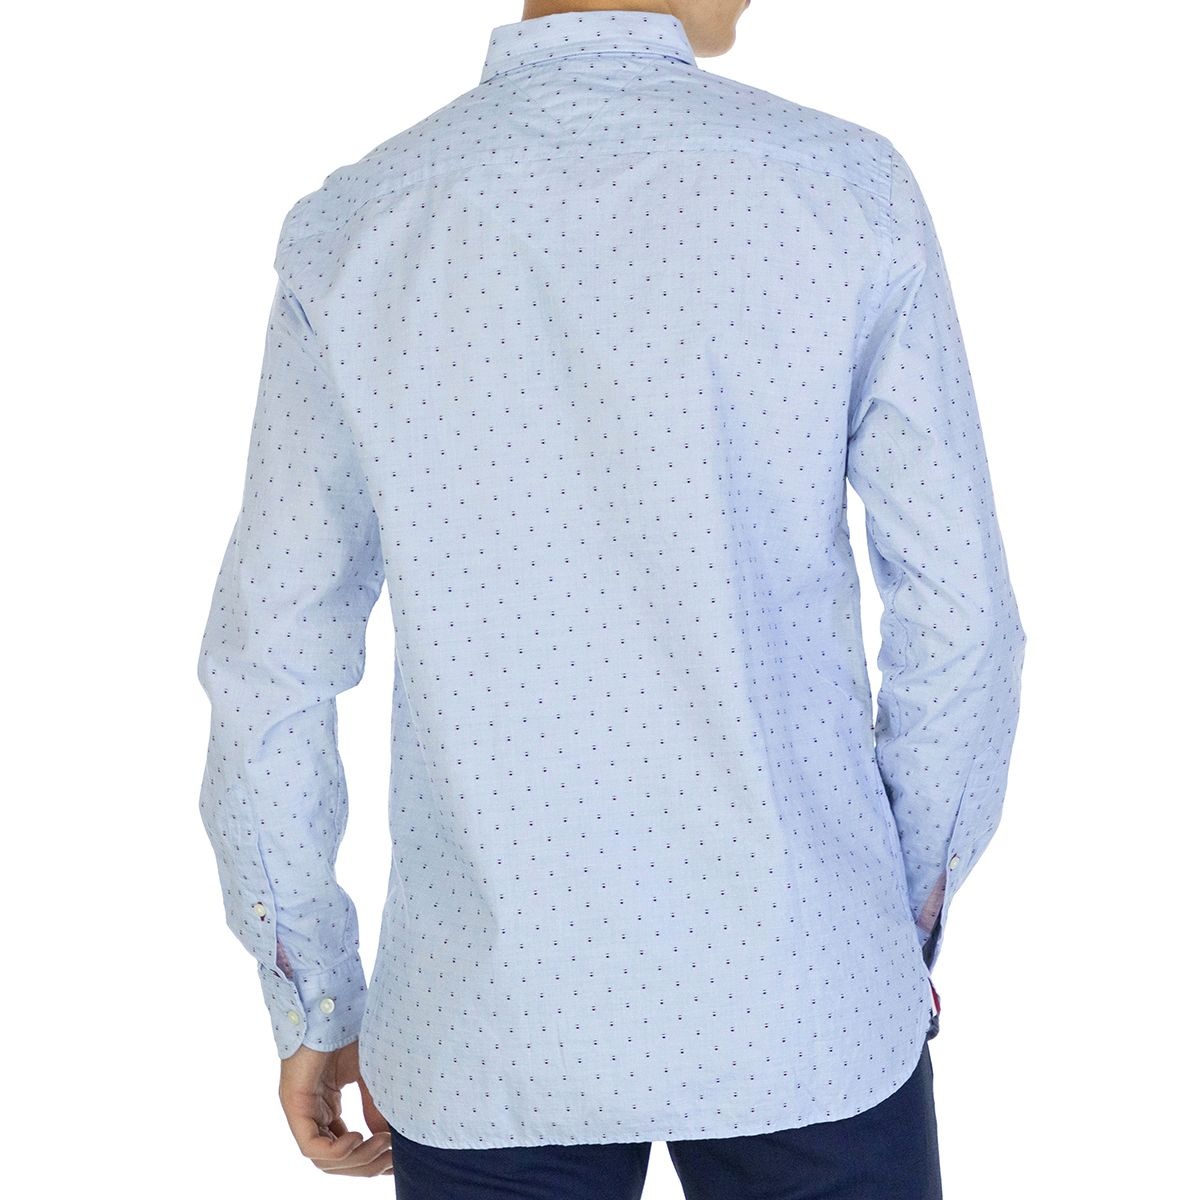 Tommy Hilfiger Men Shirt   Full sleeve Blue